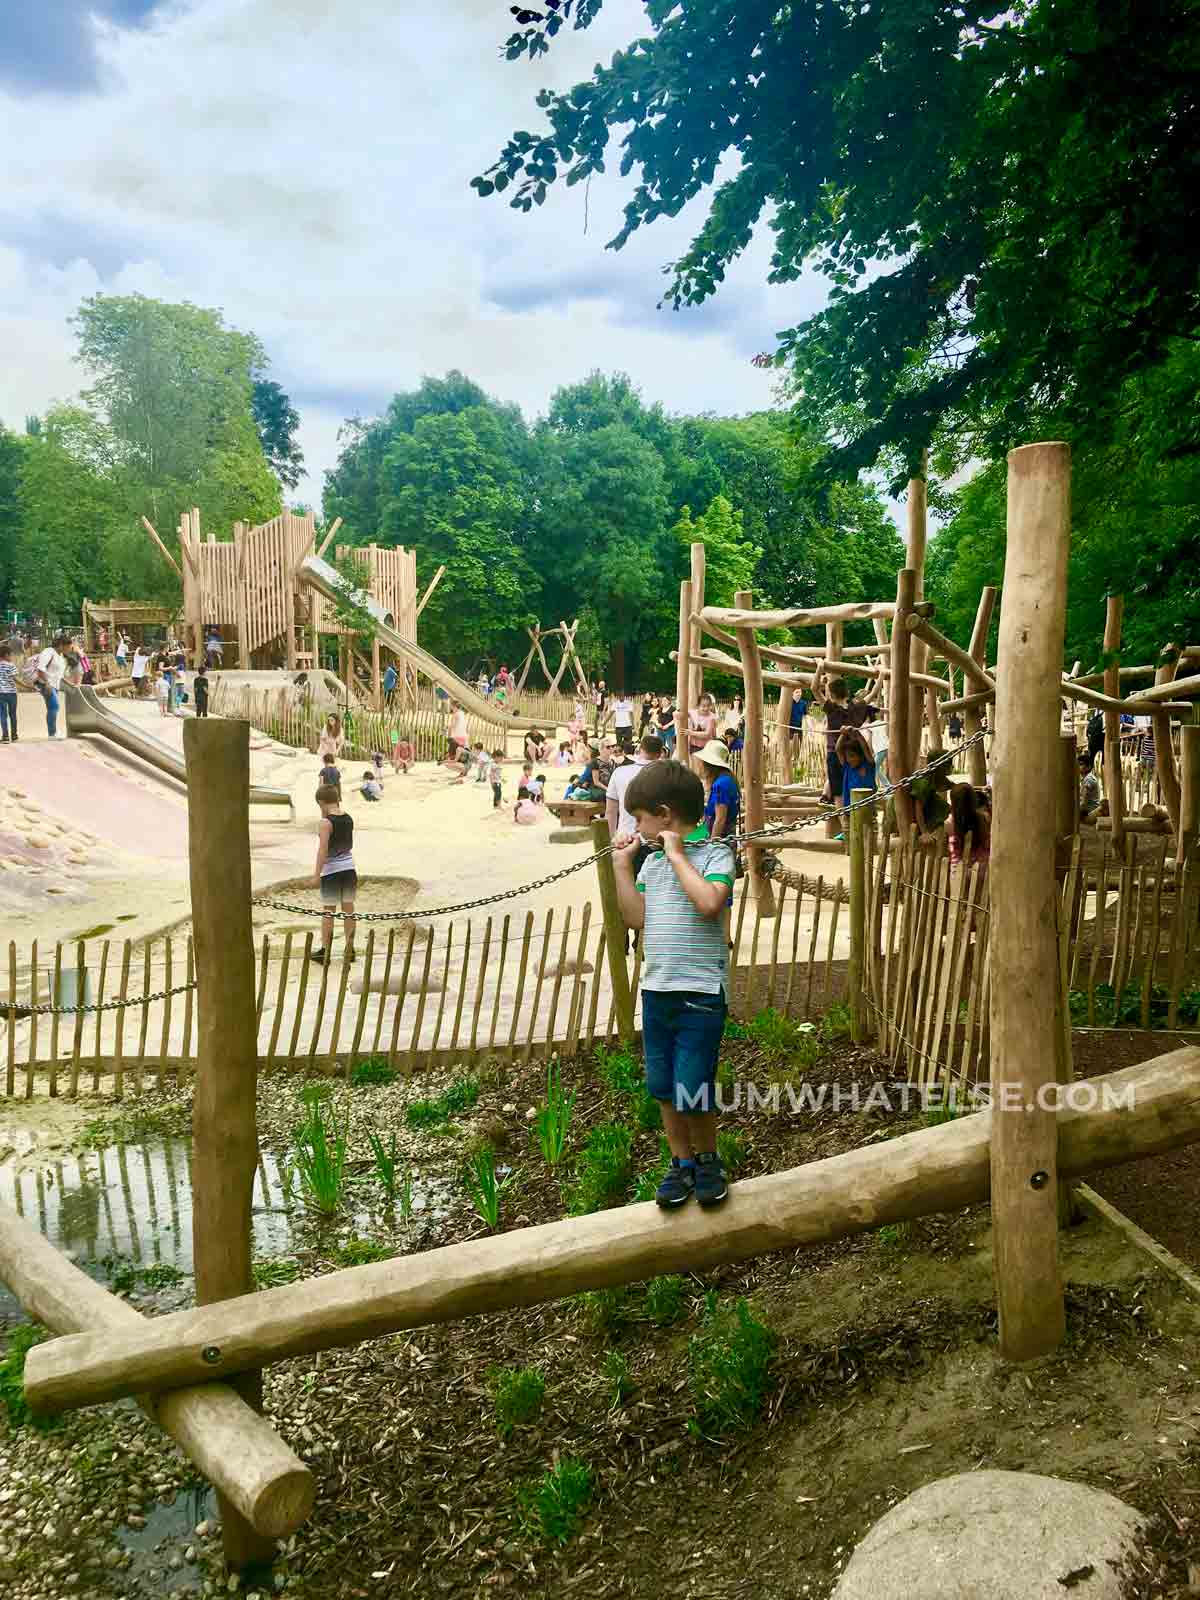 un bambino in equilibrio in un playground